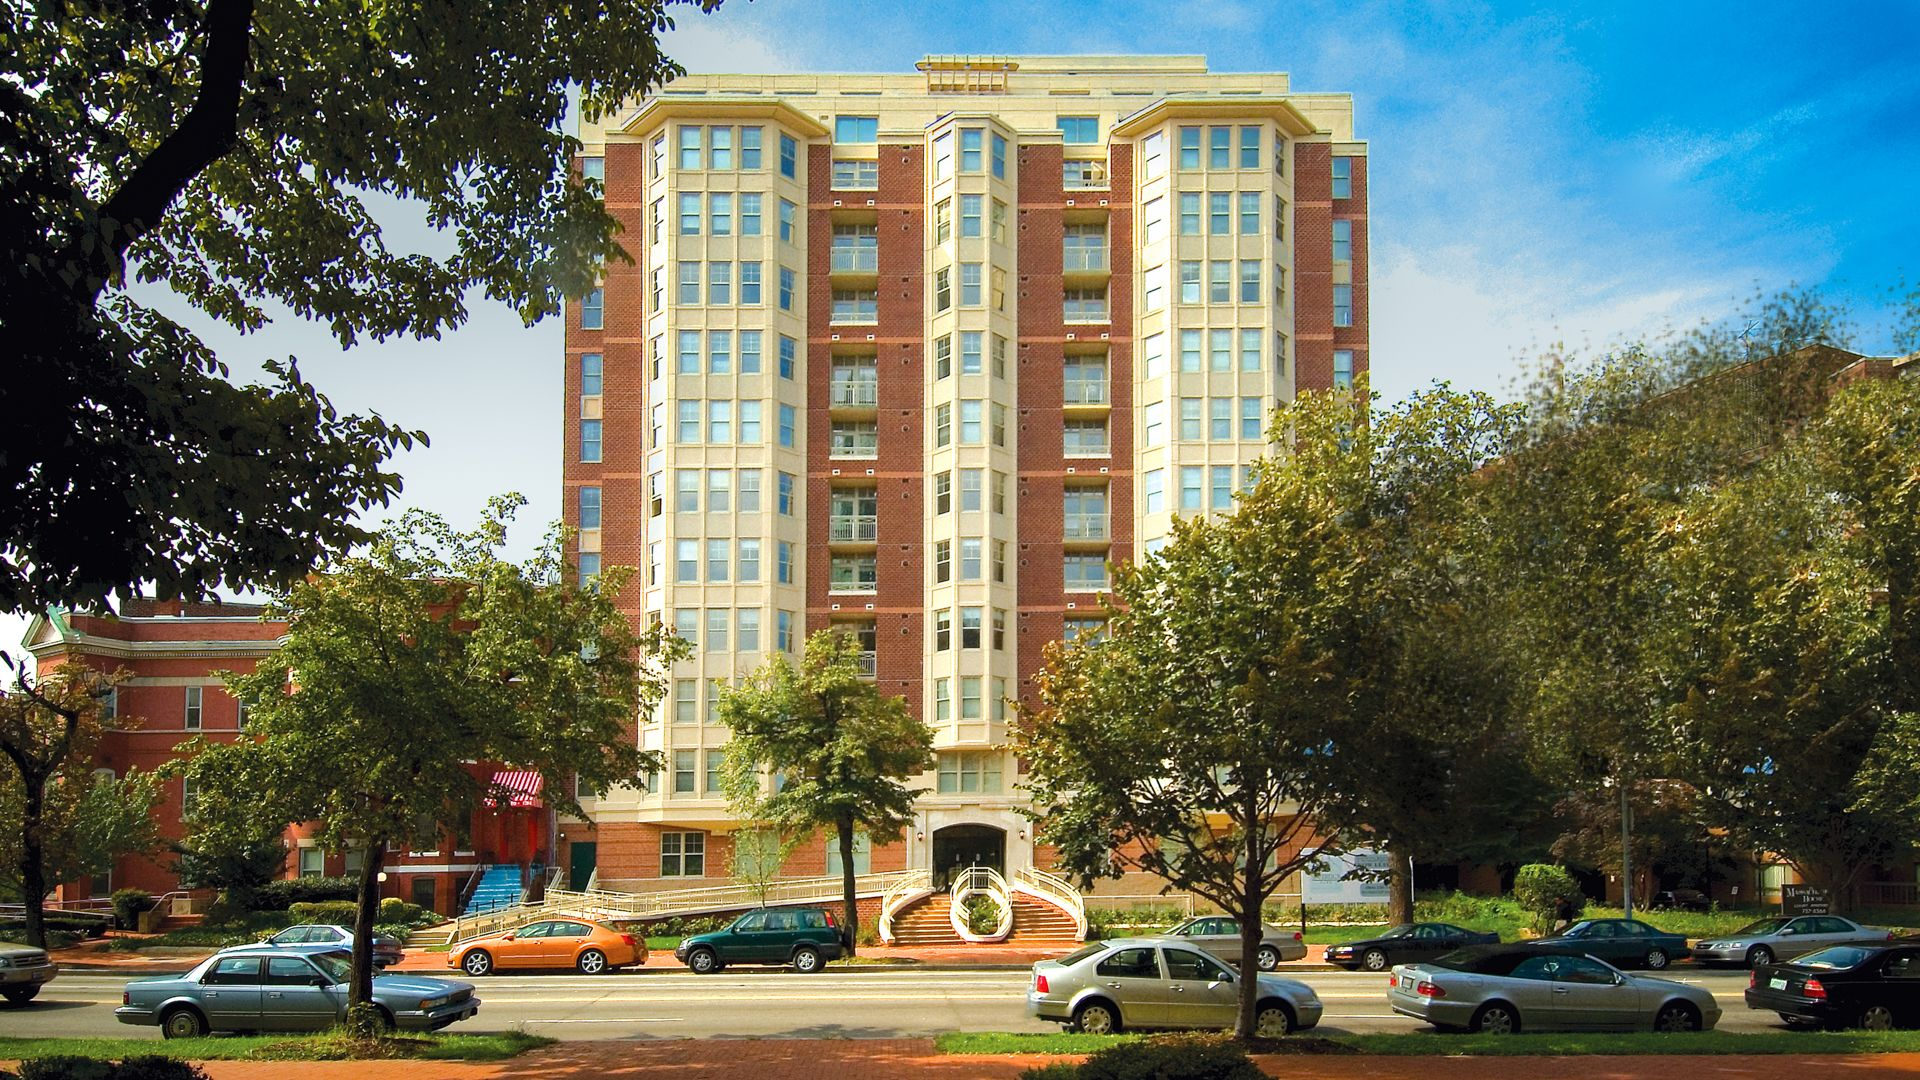 1210 Mass Apartments Thomas Circle 1210 Massachusetts Ave NW